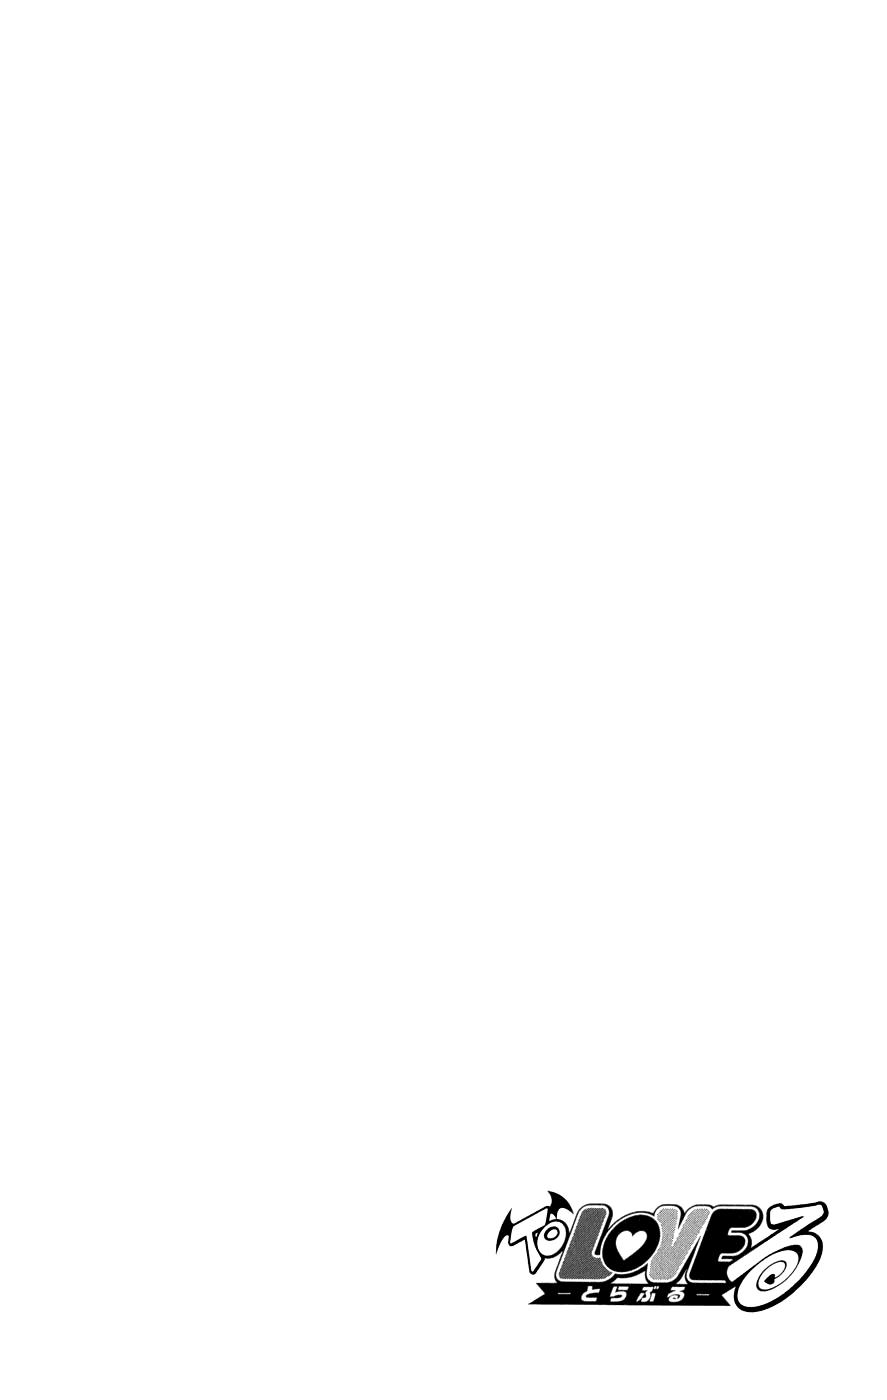 Манга Любовные неприятности / To Love-Ru  - Том 7 Глава 56 Страница 20